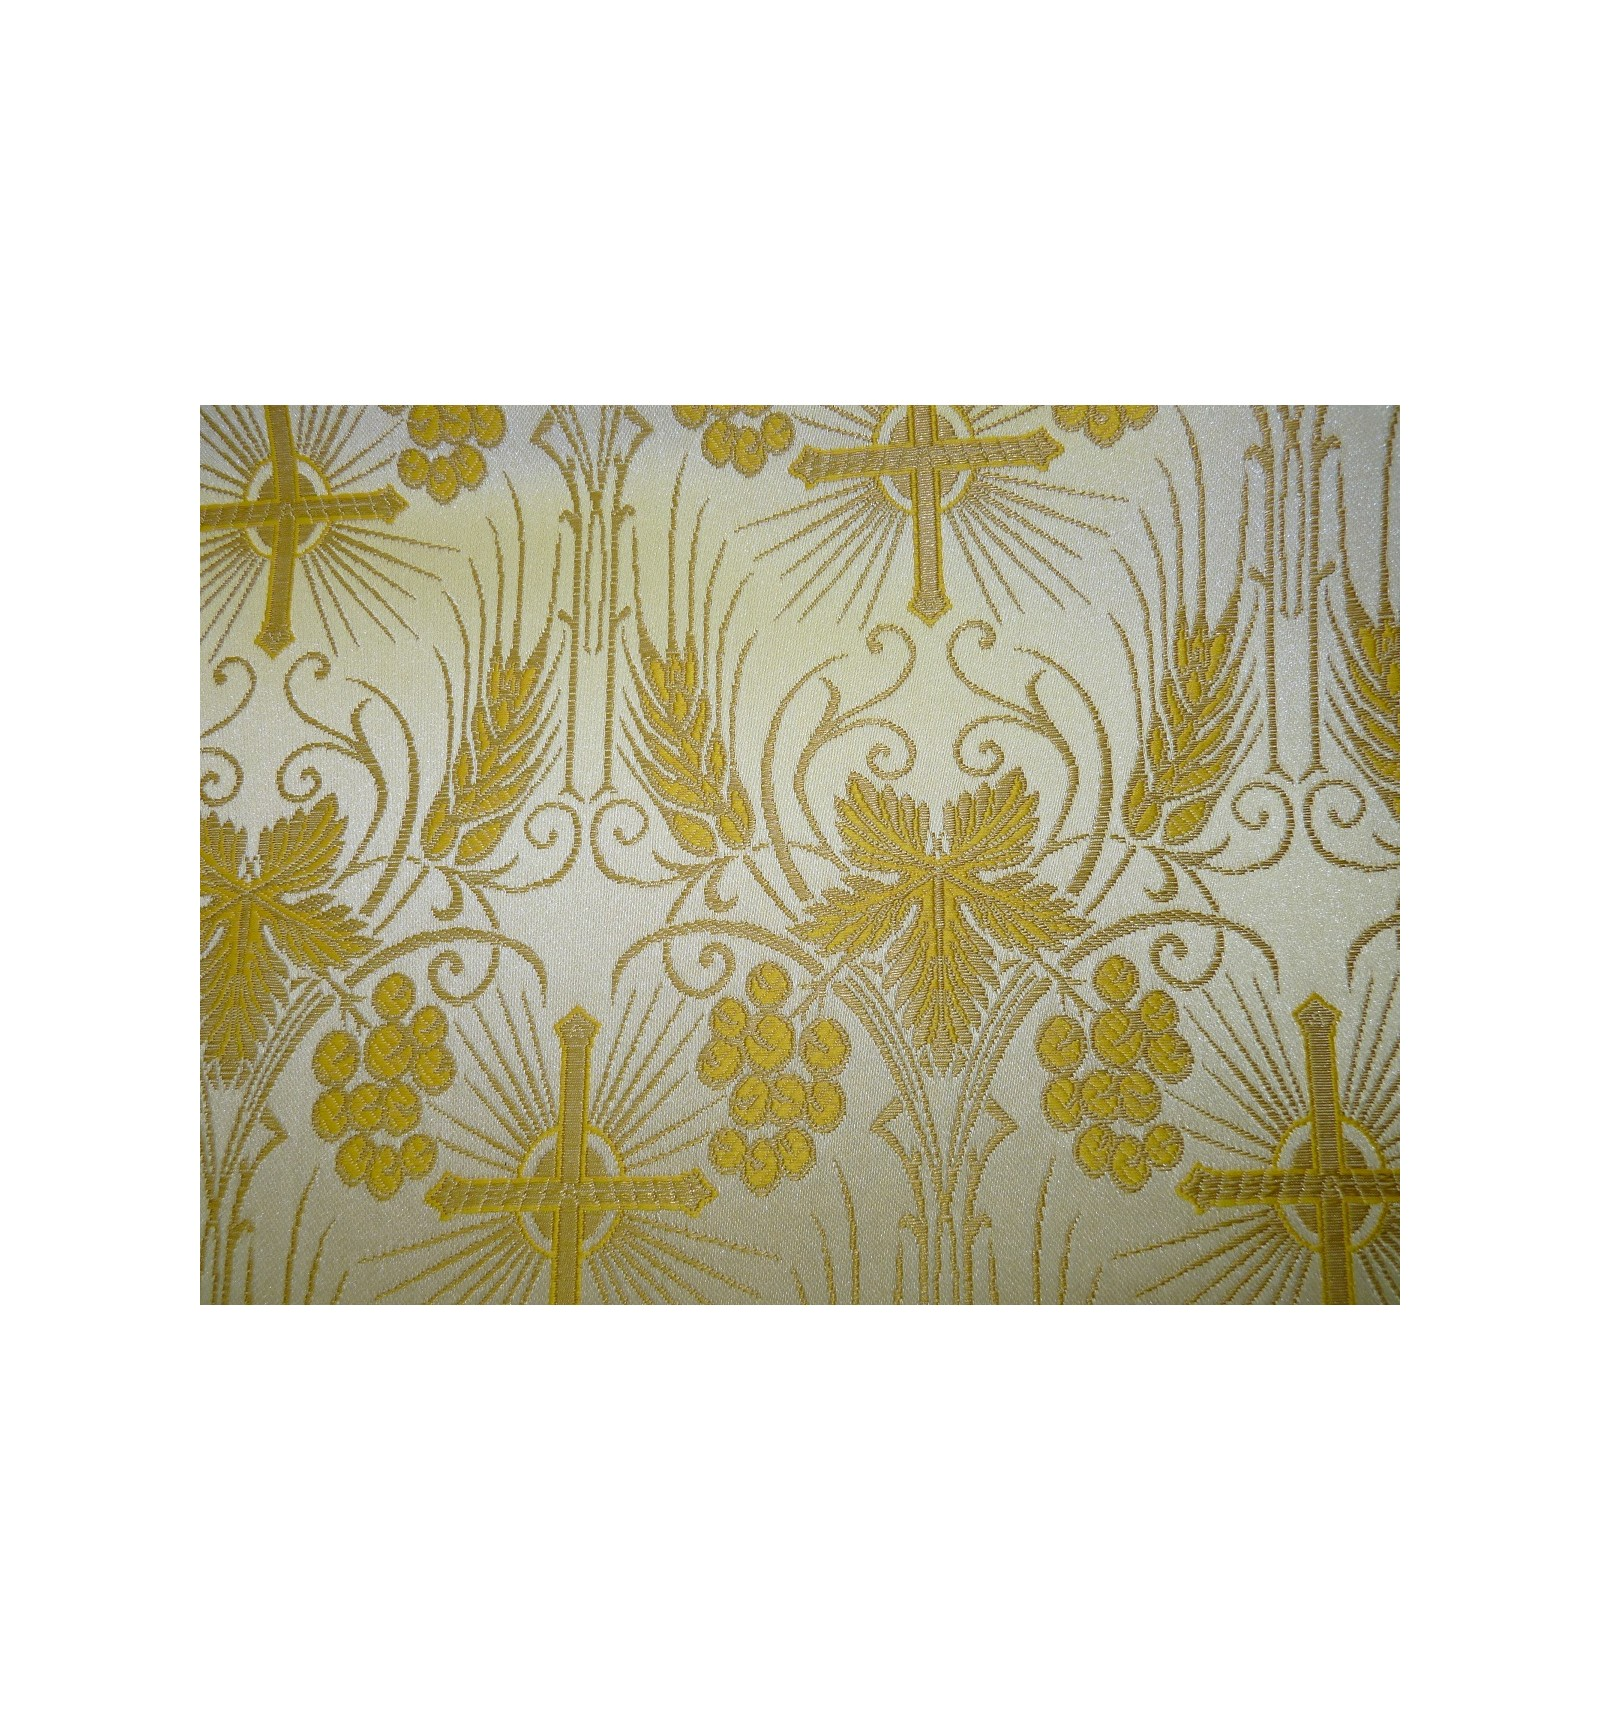 tissu damass baldam303 inter nos chasuble. Black Bedroom Furniture Sets. Home Design Ideas